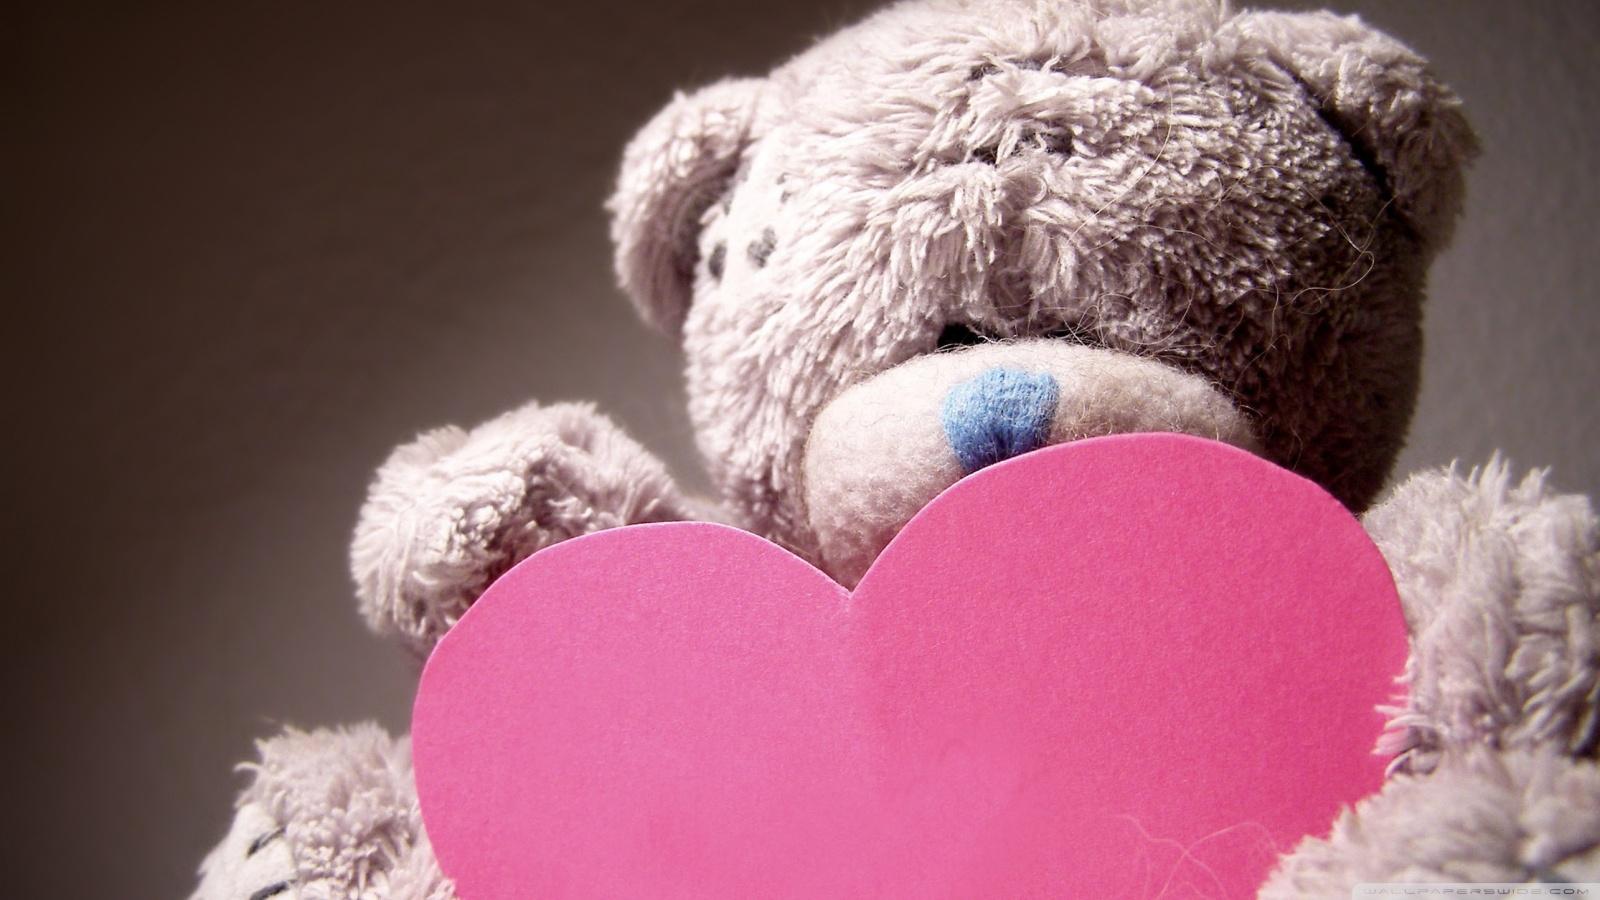 valentines day teddy bear ❤ uhd desktop wallpaper for ultra hd 4k